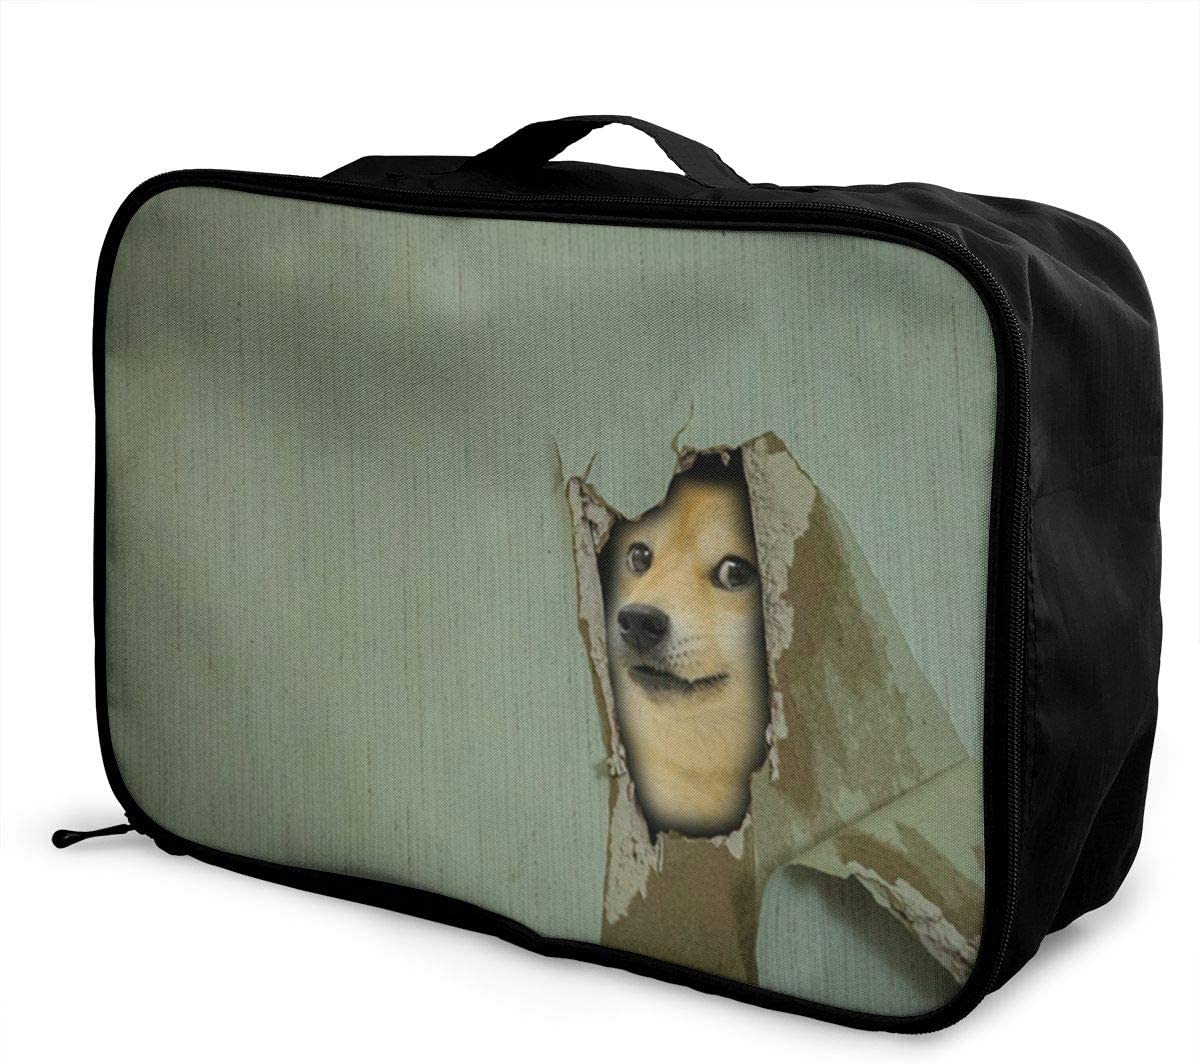 Doge-memes Travel Carry-on Luggage Weekender Bag Overnight Tote Flight Duffel In Trolley Handle